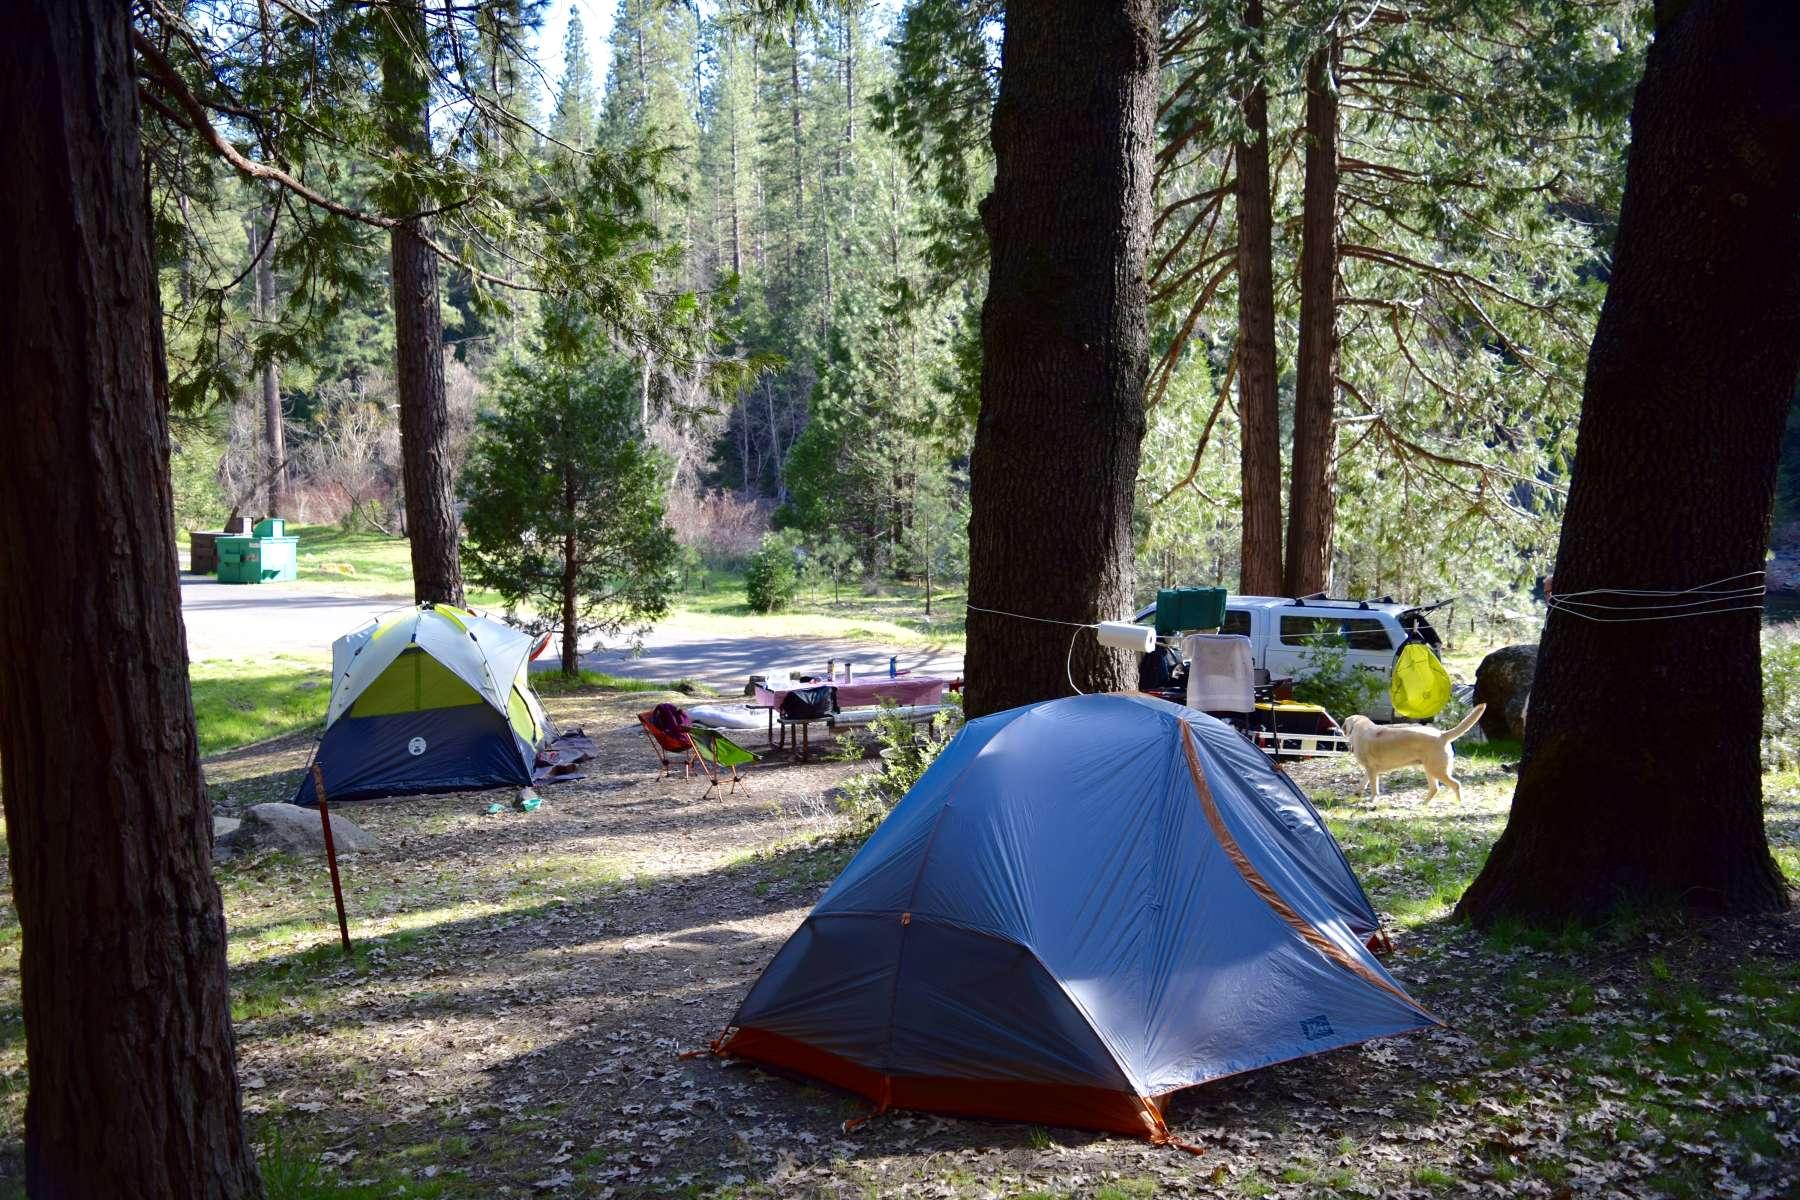 Wawona Campground Yosemite Ca 21 Hipcamper Reviews And